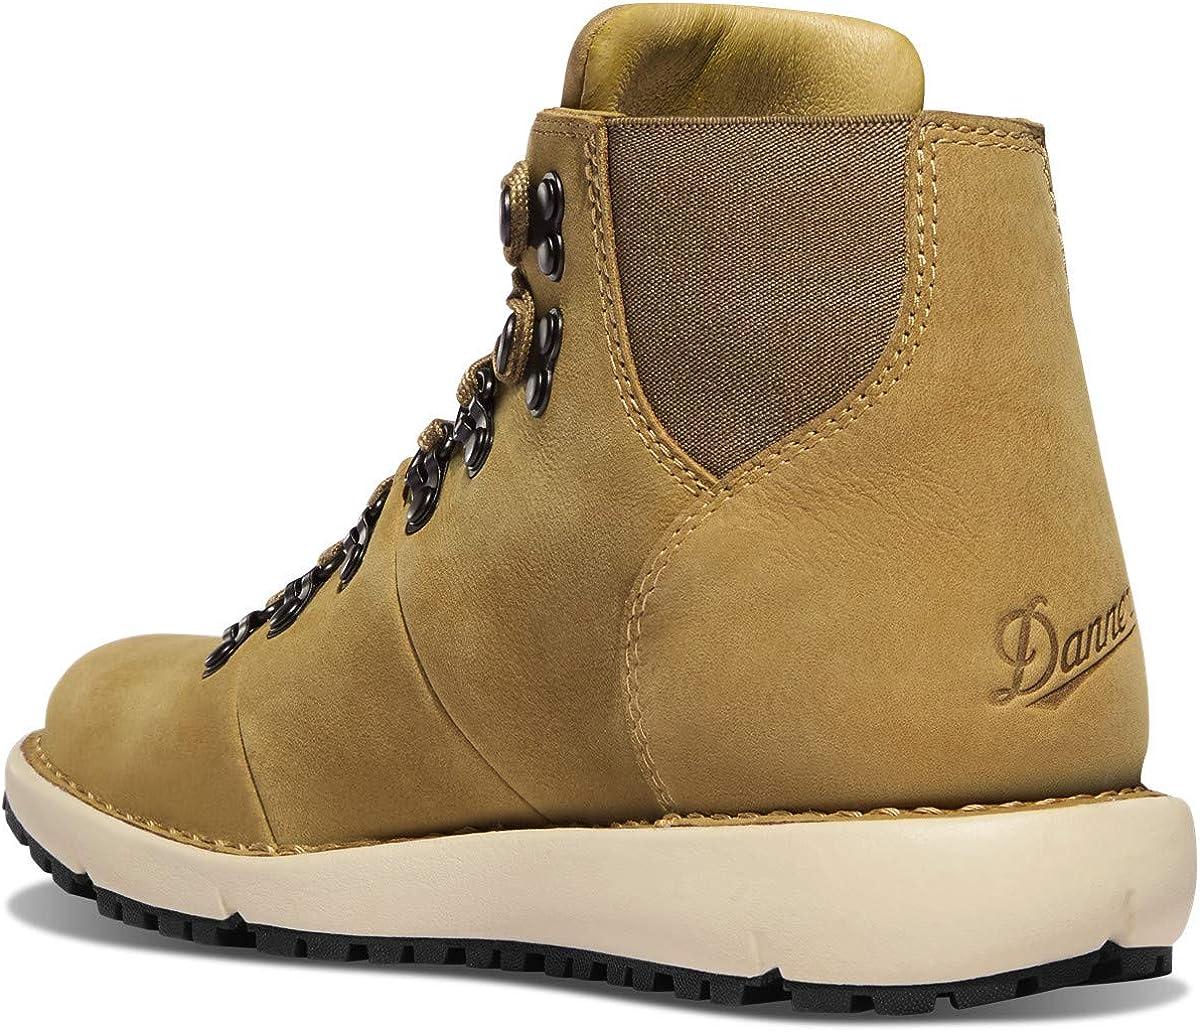 Danner Womens Vertigo 917 5 Gore-Tex Lifestyle Boot